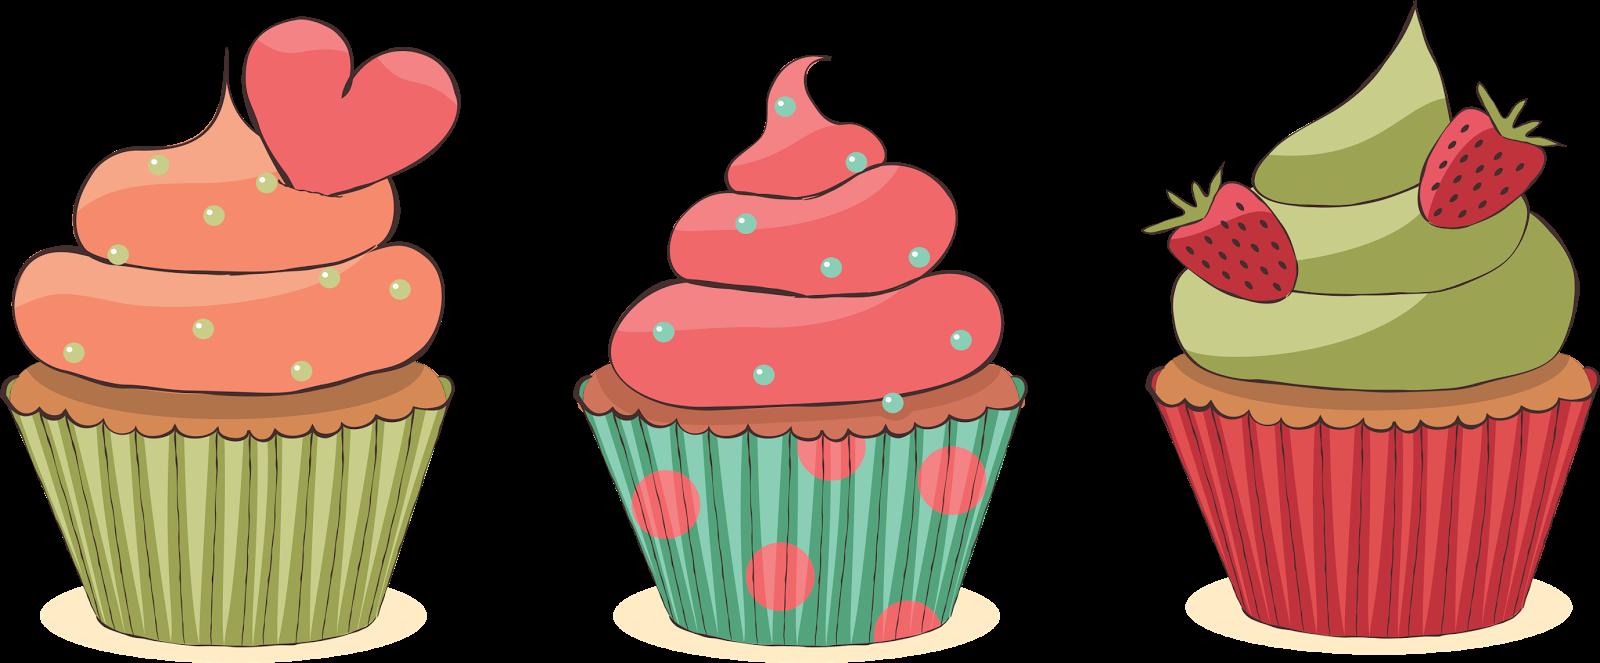 Cupcakes desenho vintage pesquisa. Muffin clipart cake and ice cream